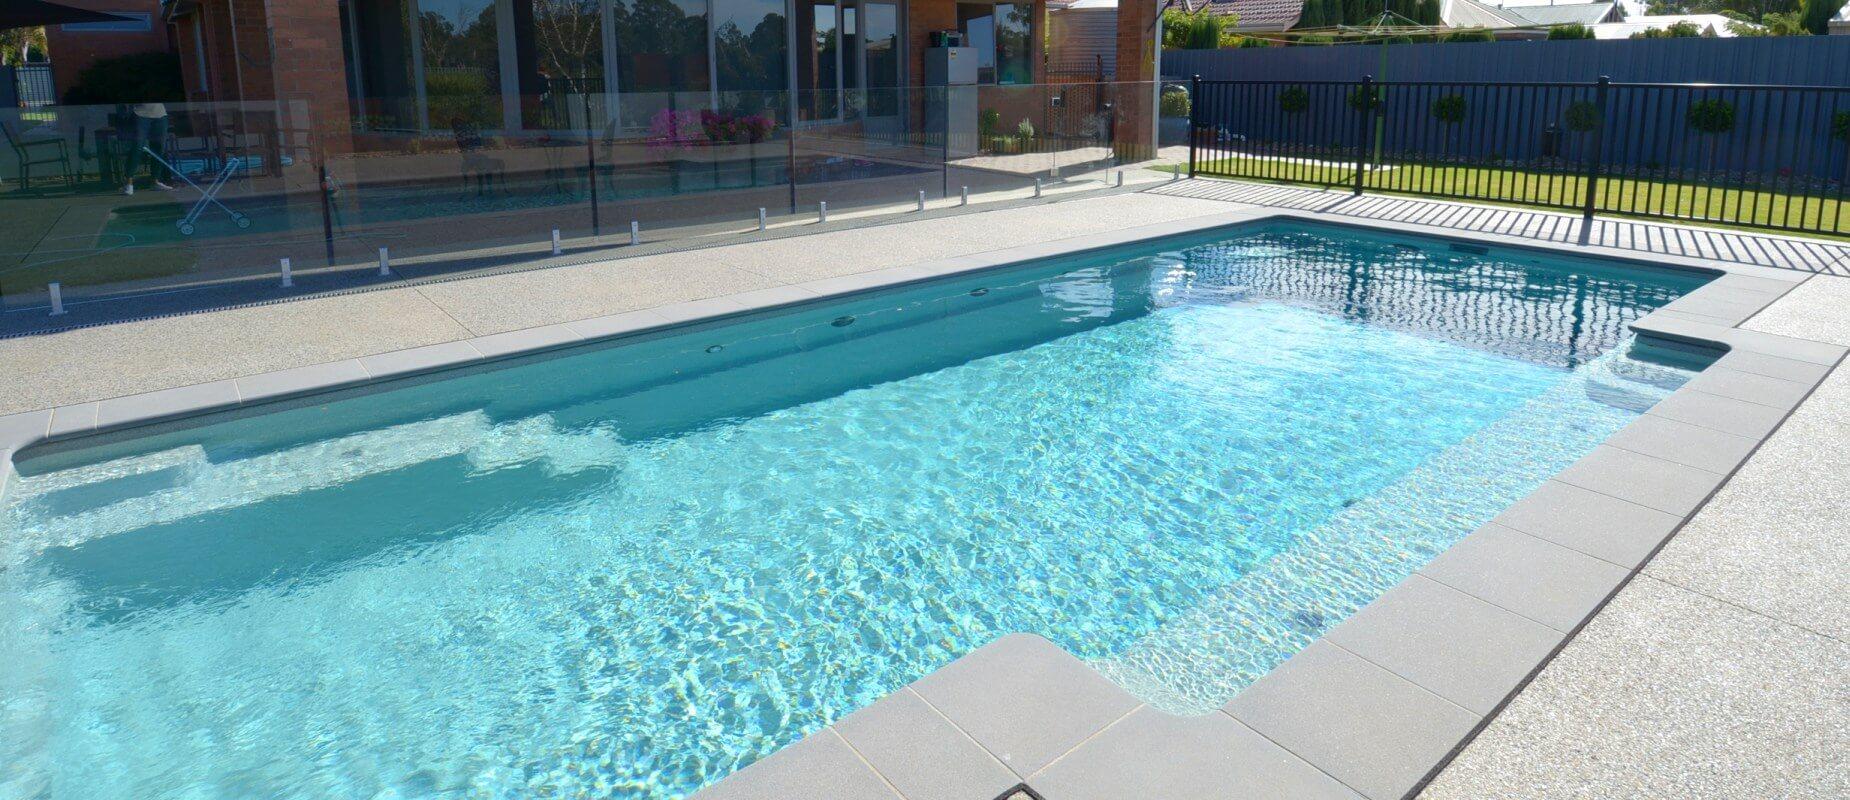 piscina de lux modele frumoase 46